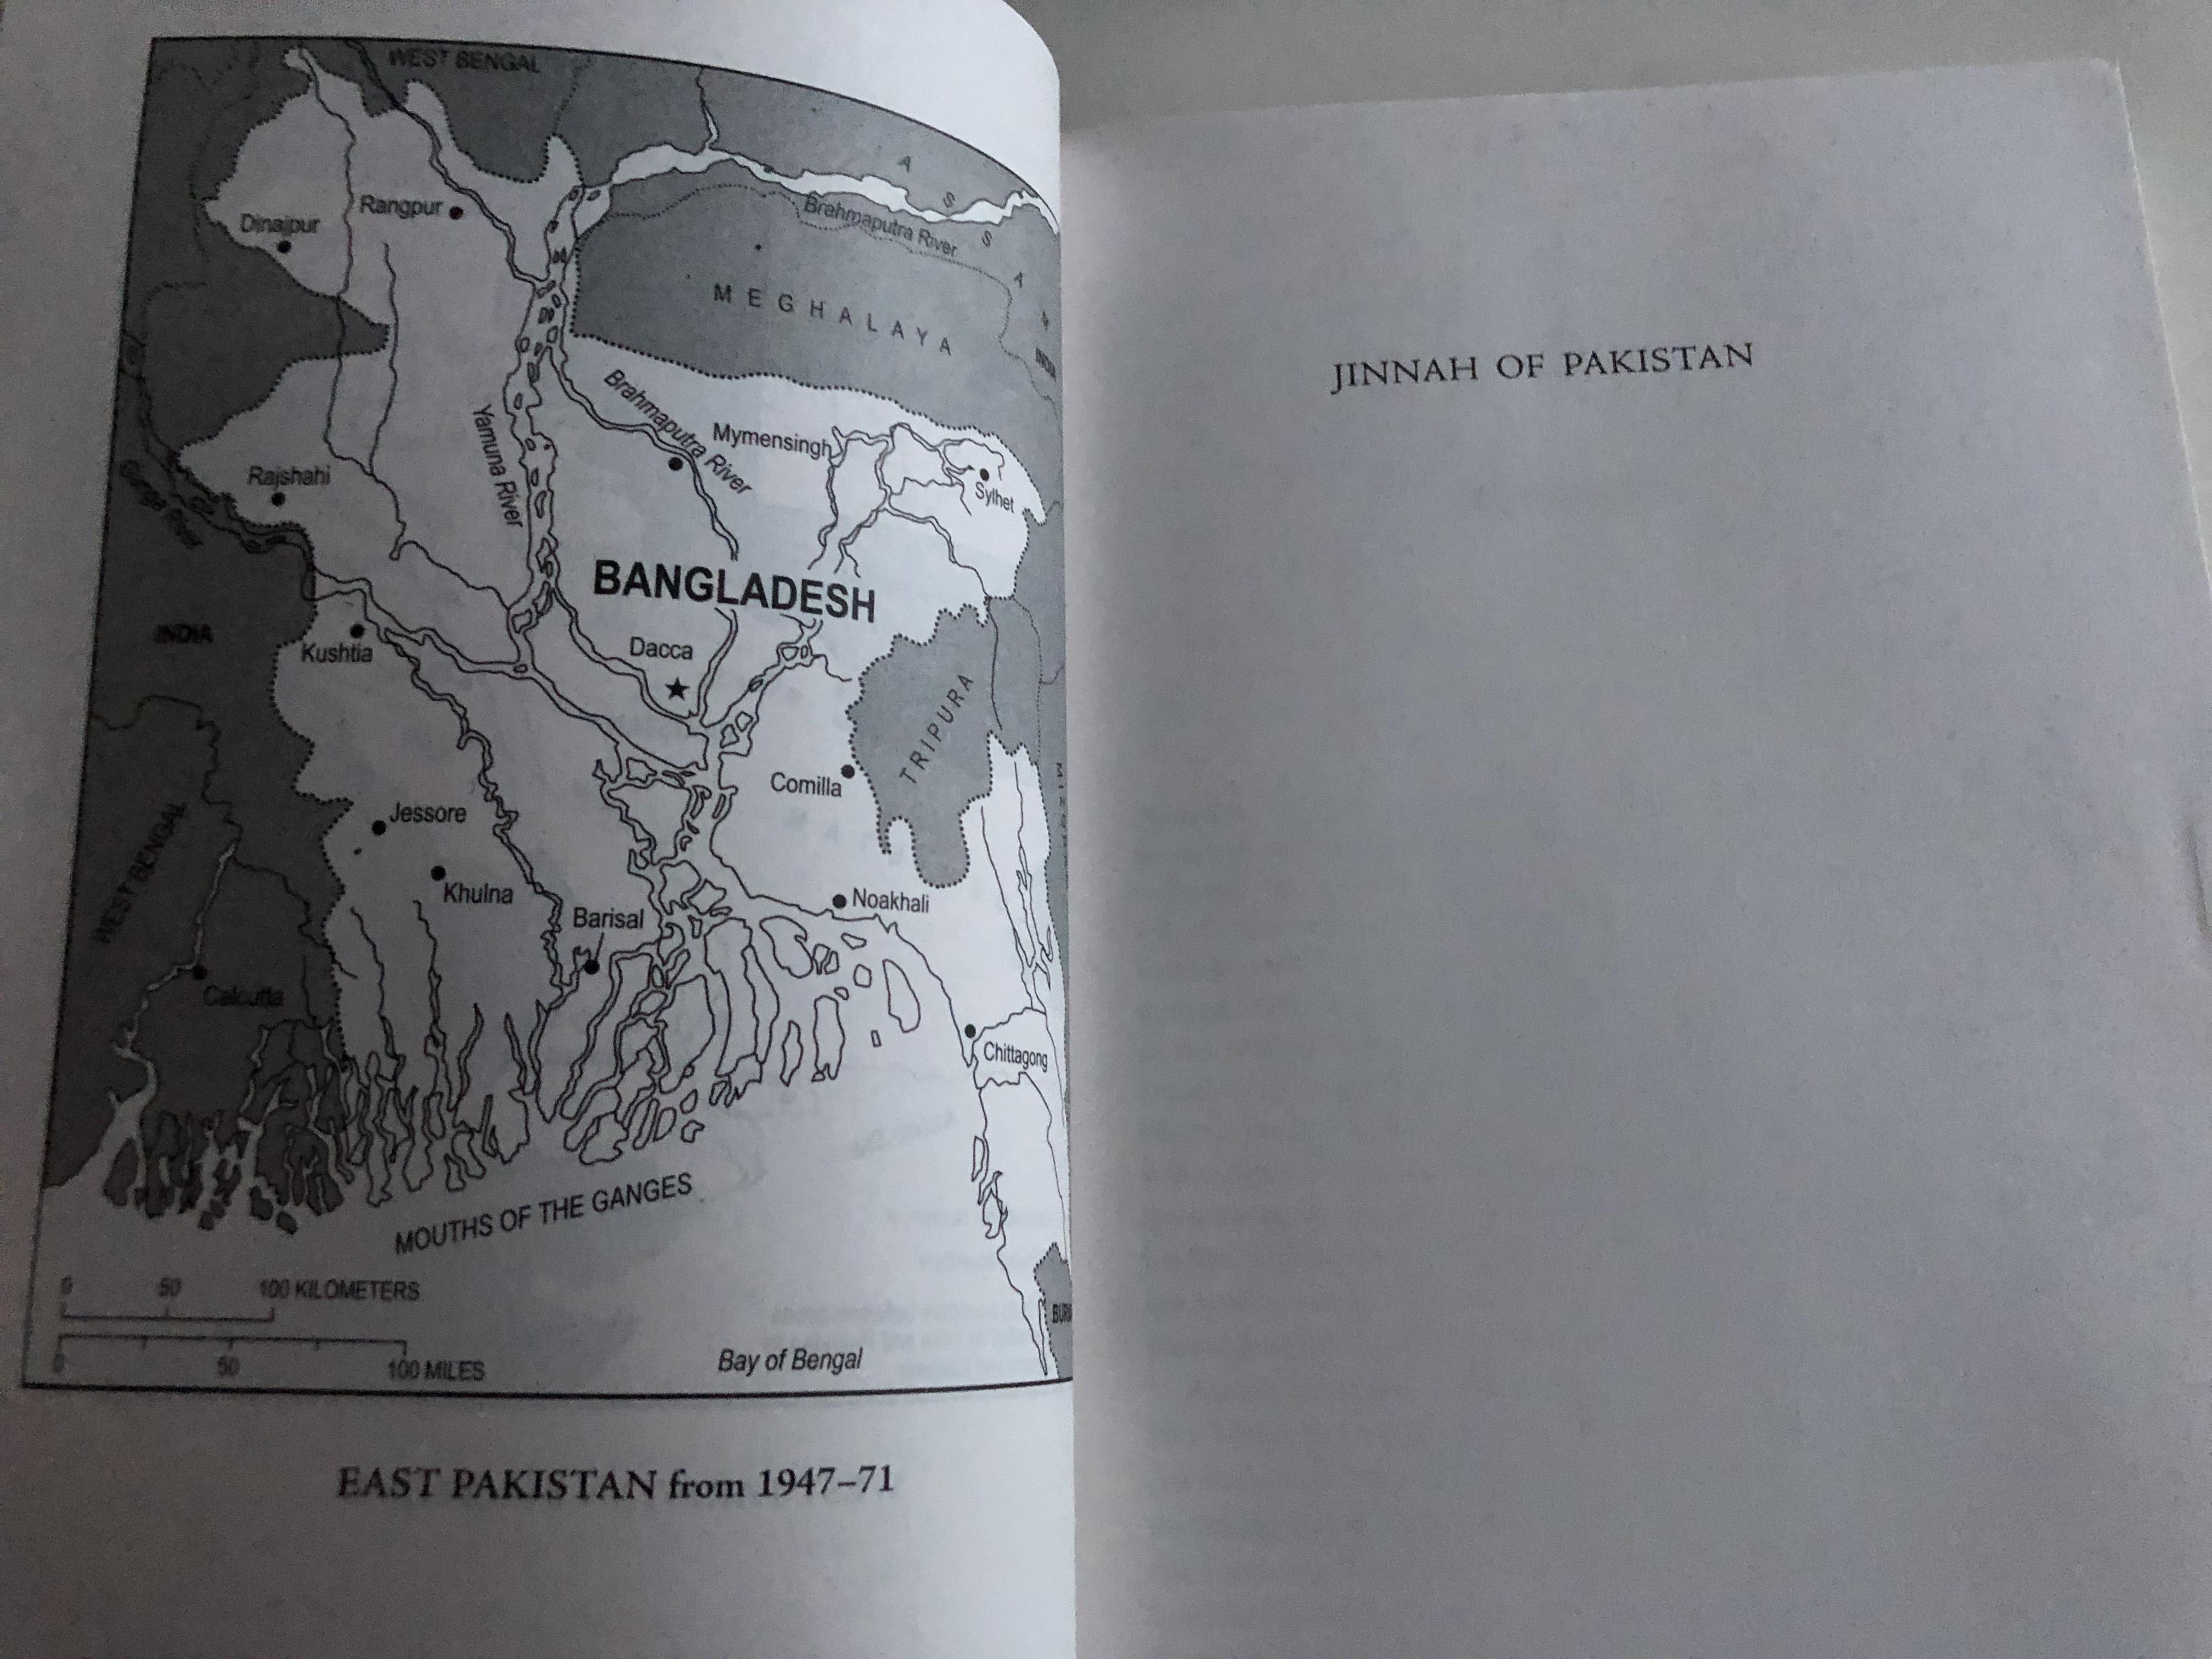 jinnah-of-pakistan-by-stanley-wolpert-oxford-pakistan-paperbacks-6-.jpg